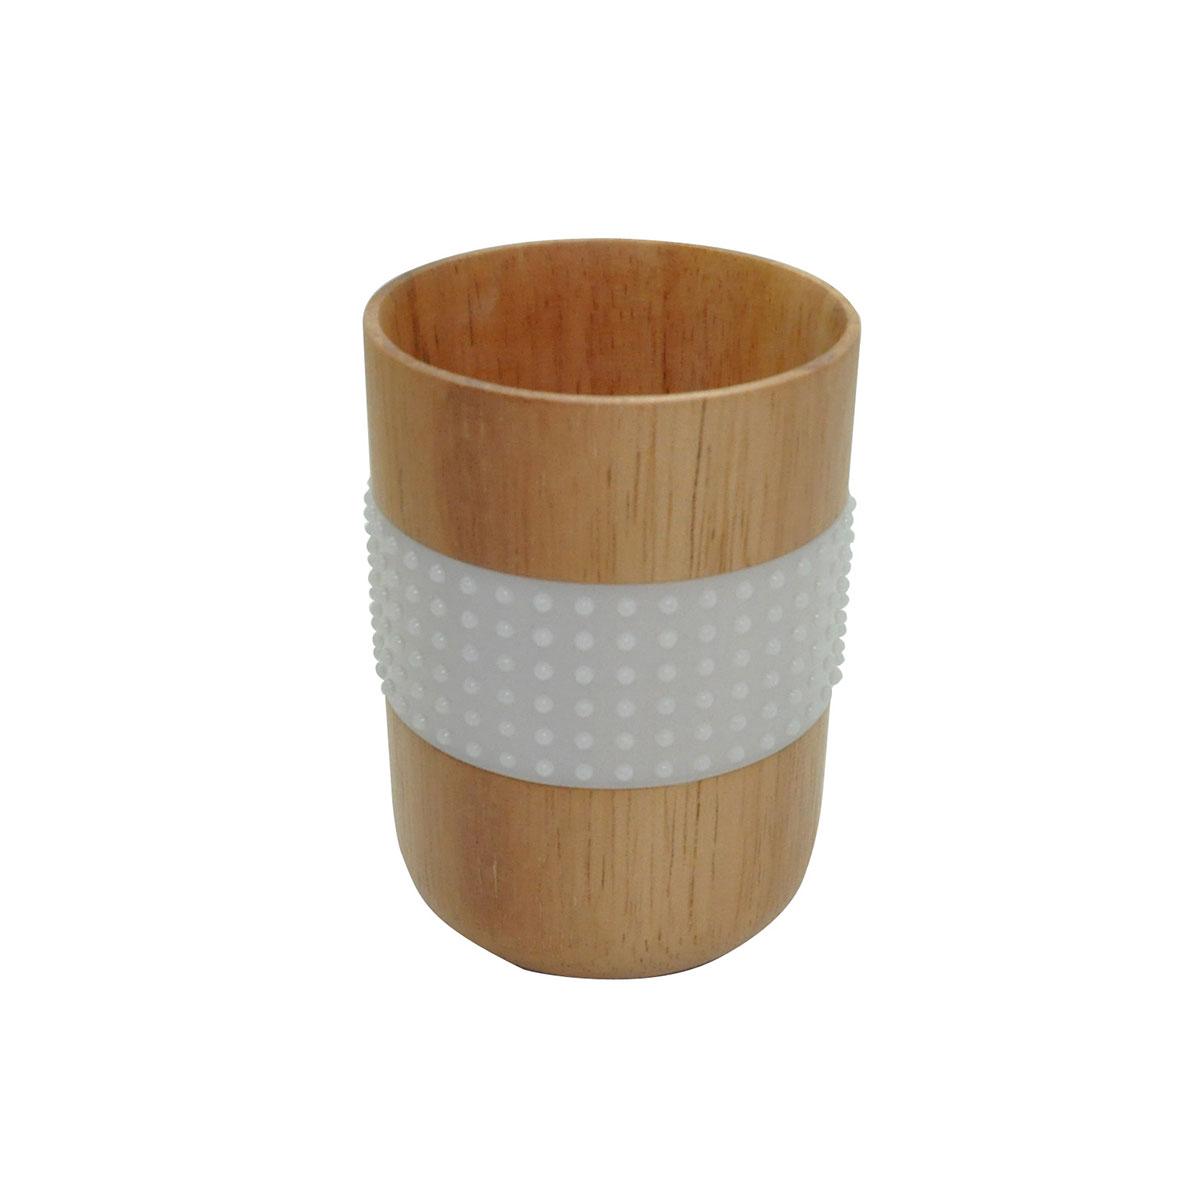 Gobelet en bois avec bande antidérapante bois et blanc